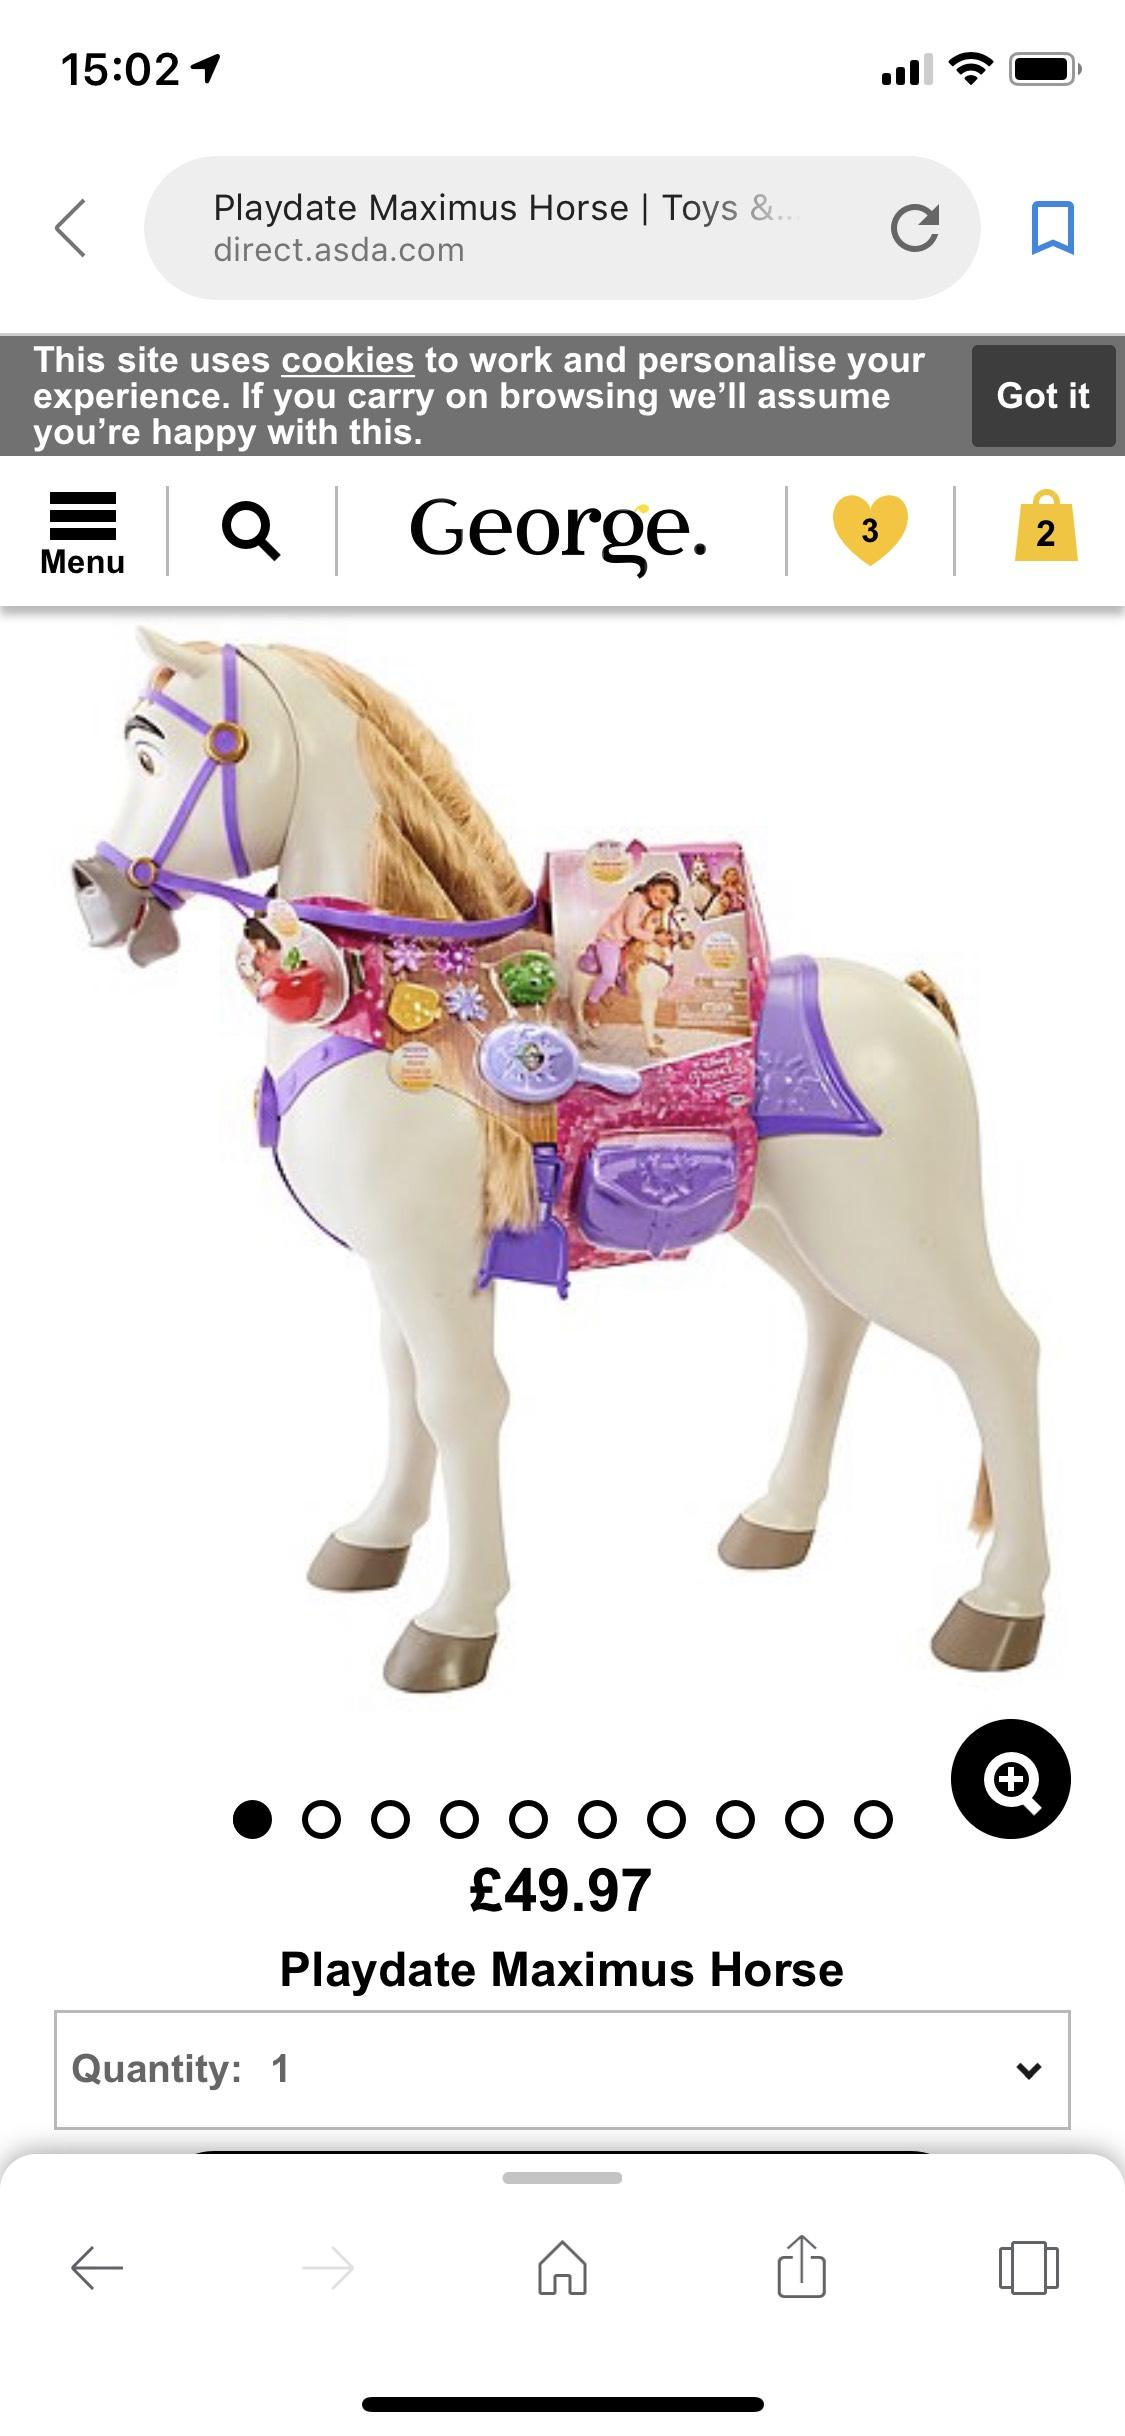 Playdate maximus horse £49.97 / £55.92 delivered george asda